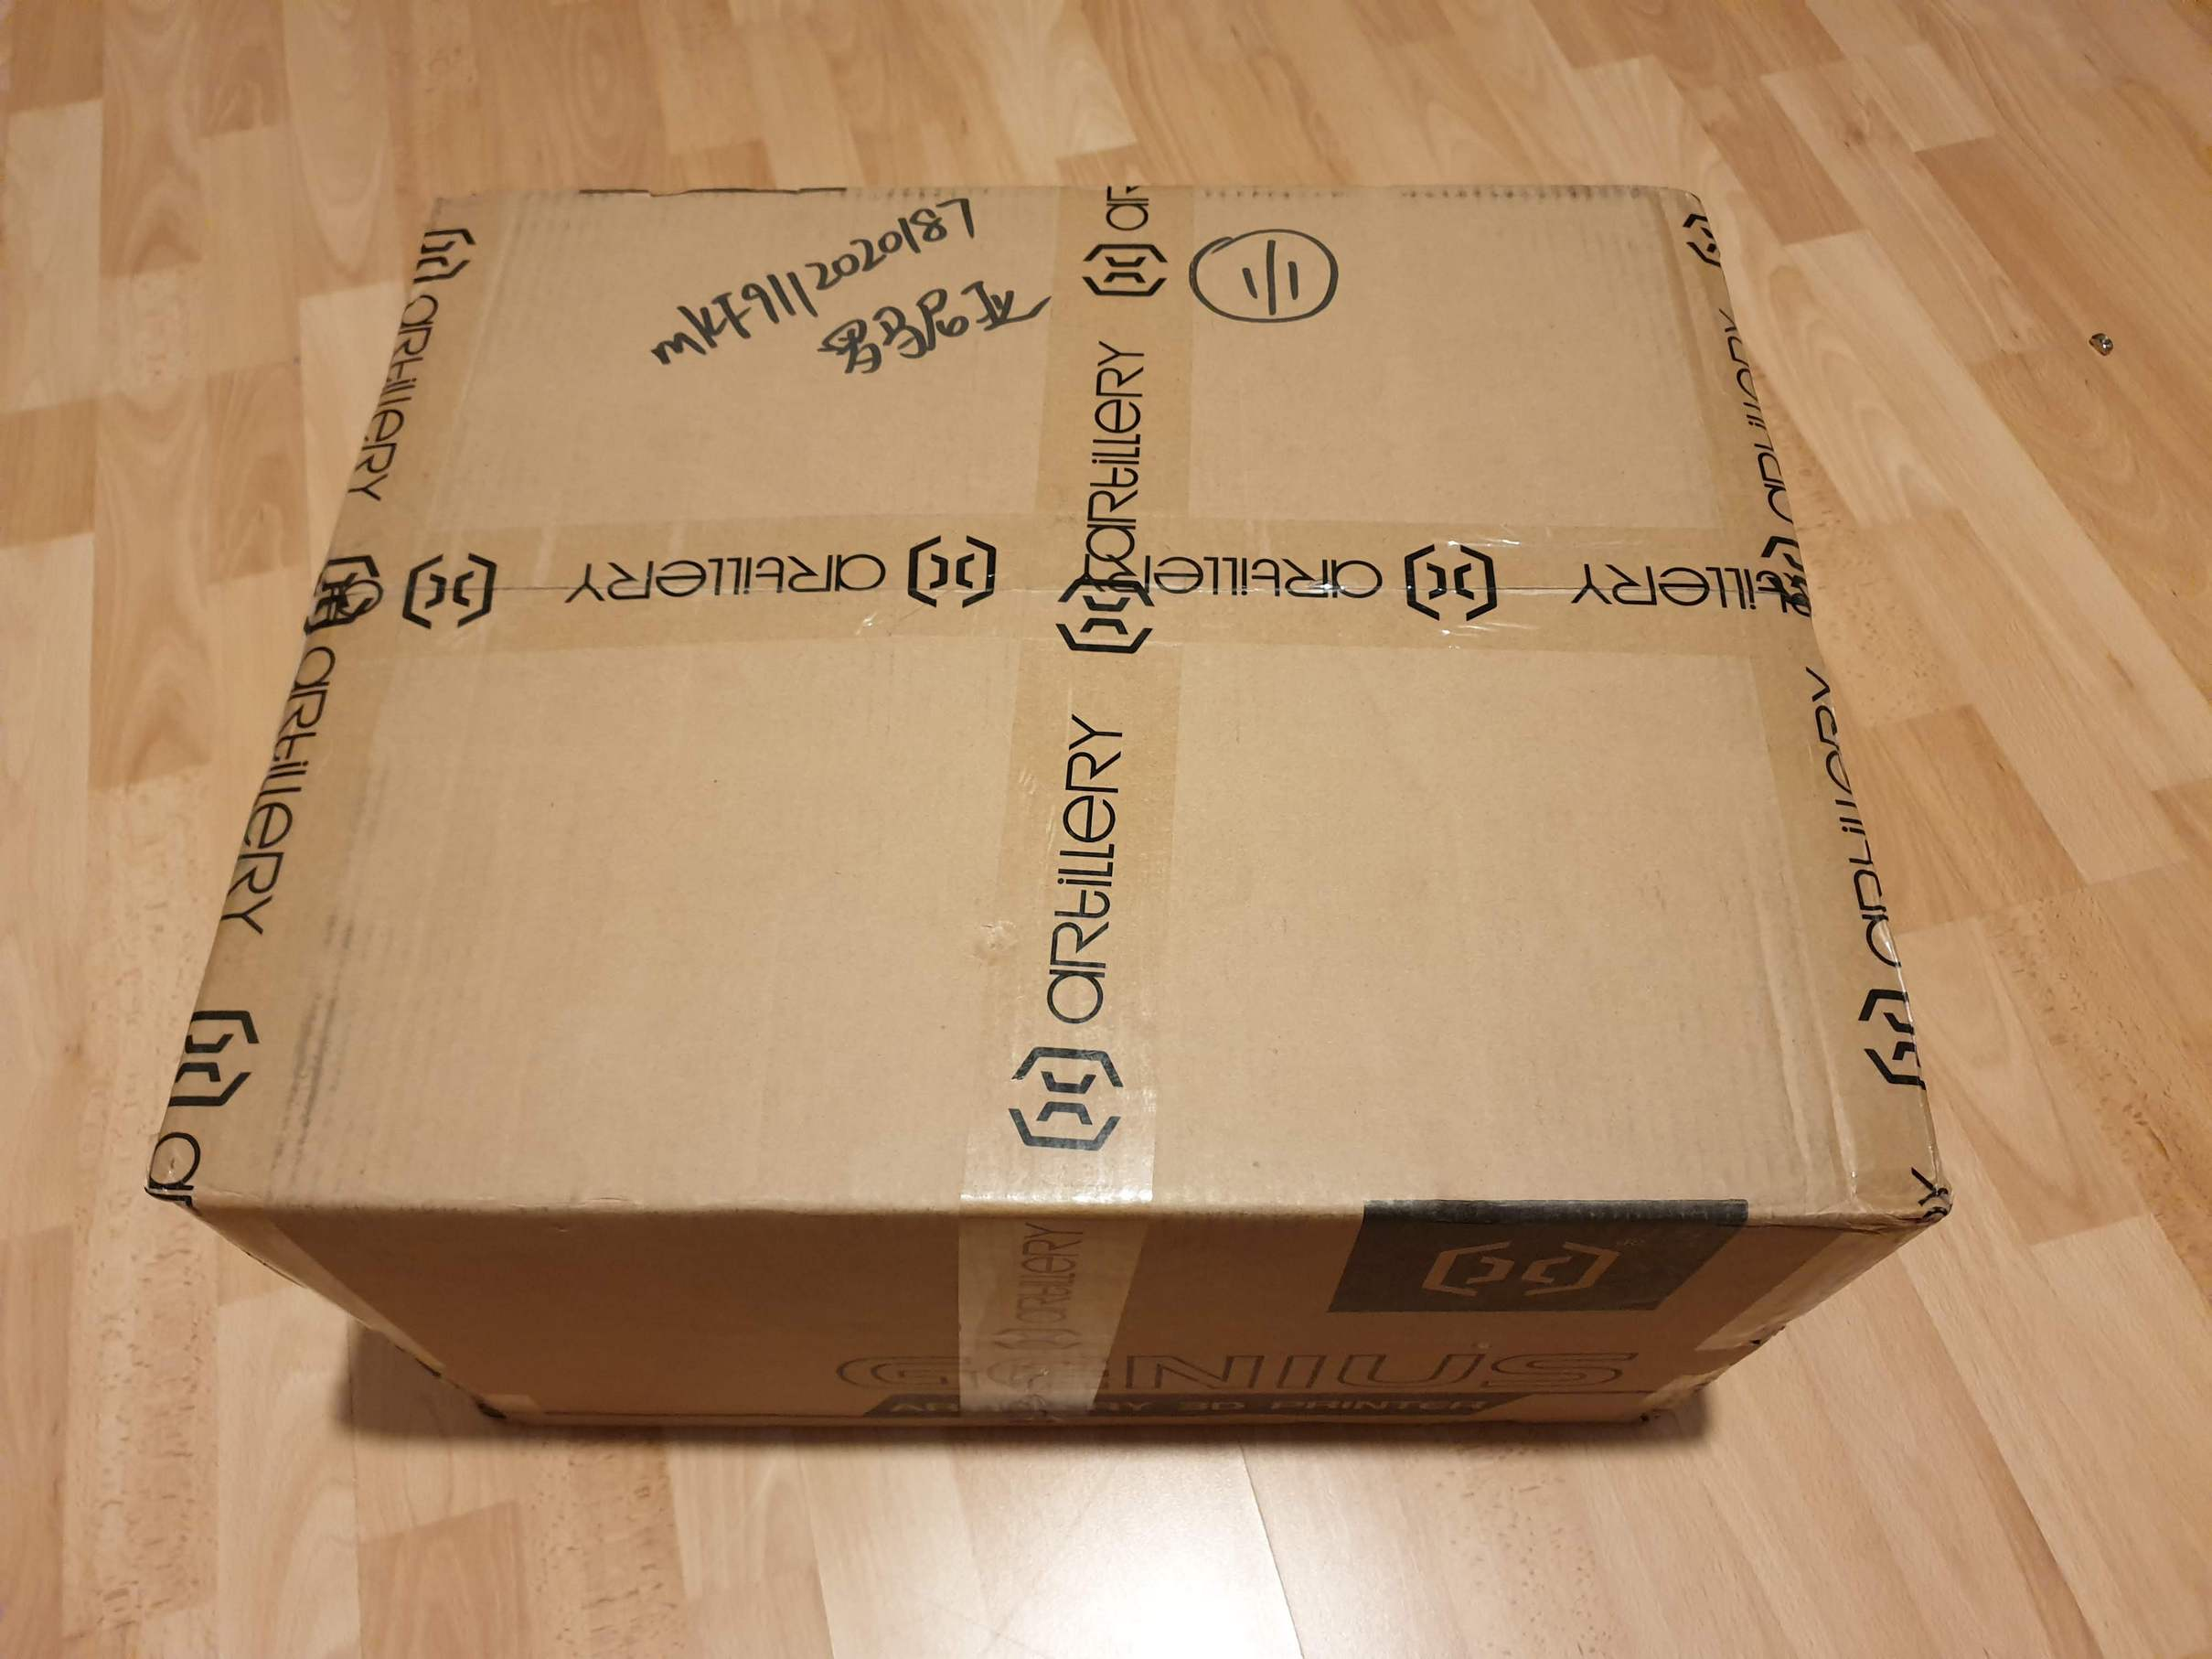 Artillery Genius Packaging 2   Artillery Genius Review - Is it any good?